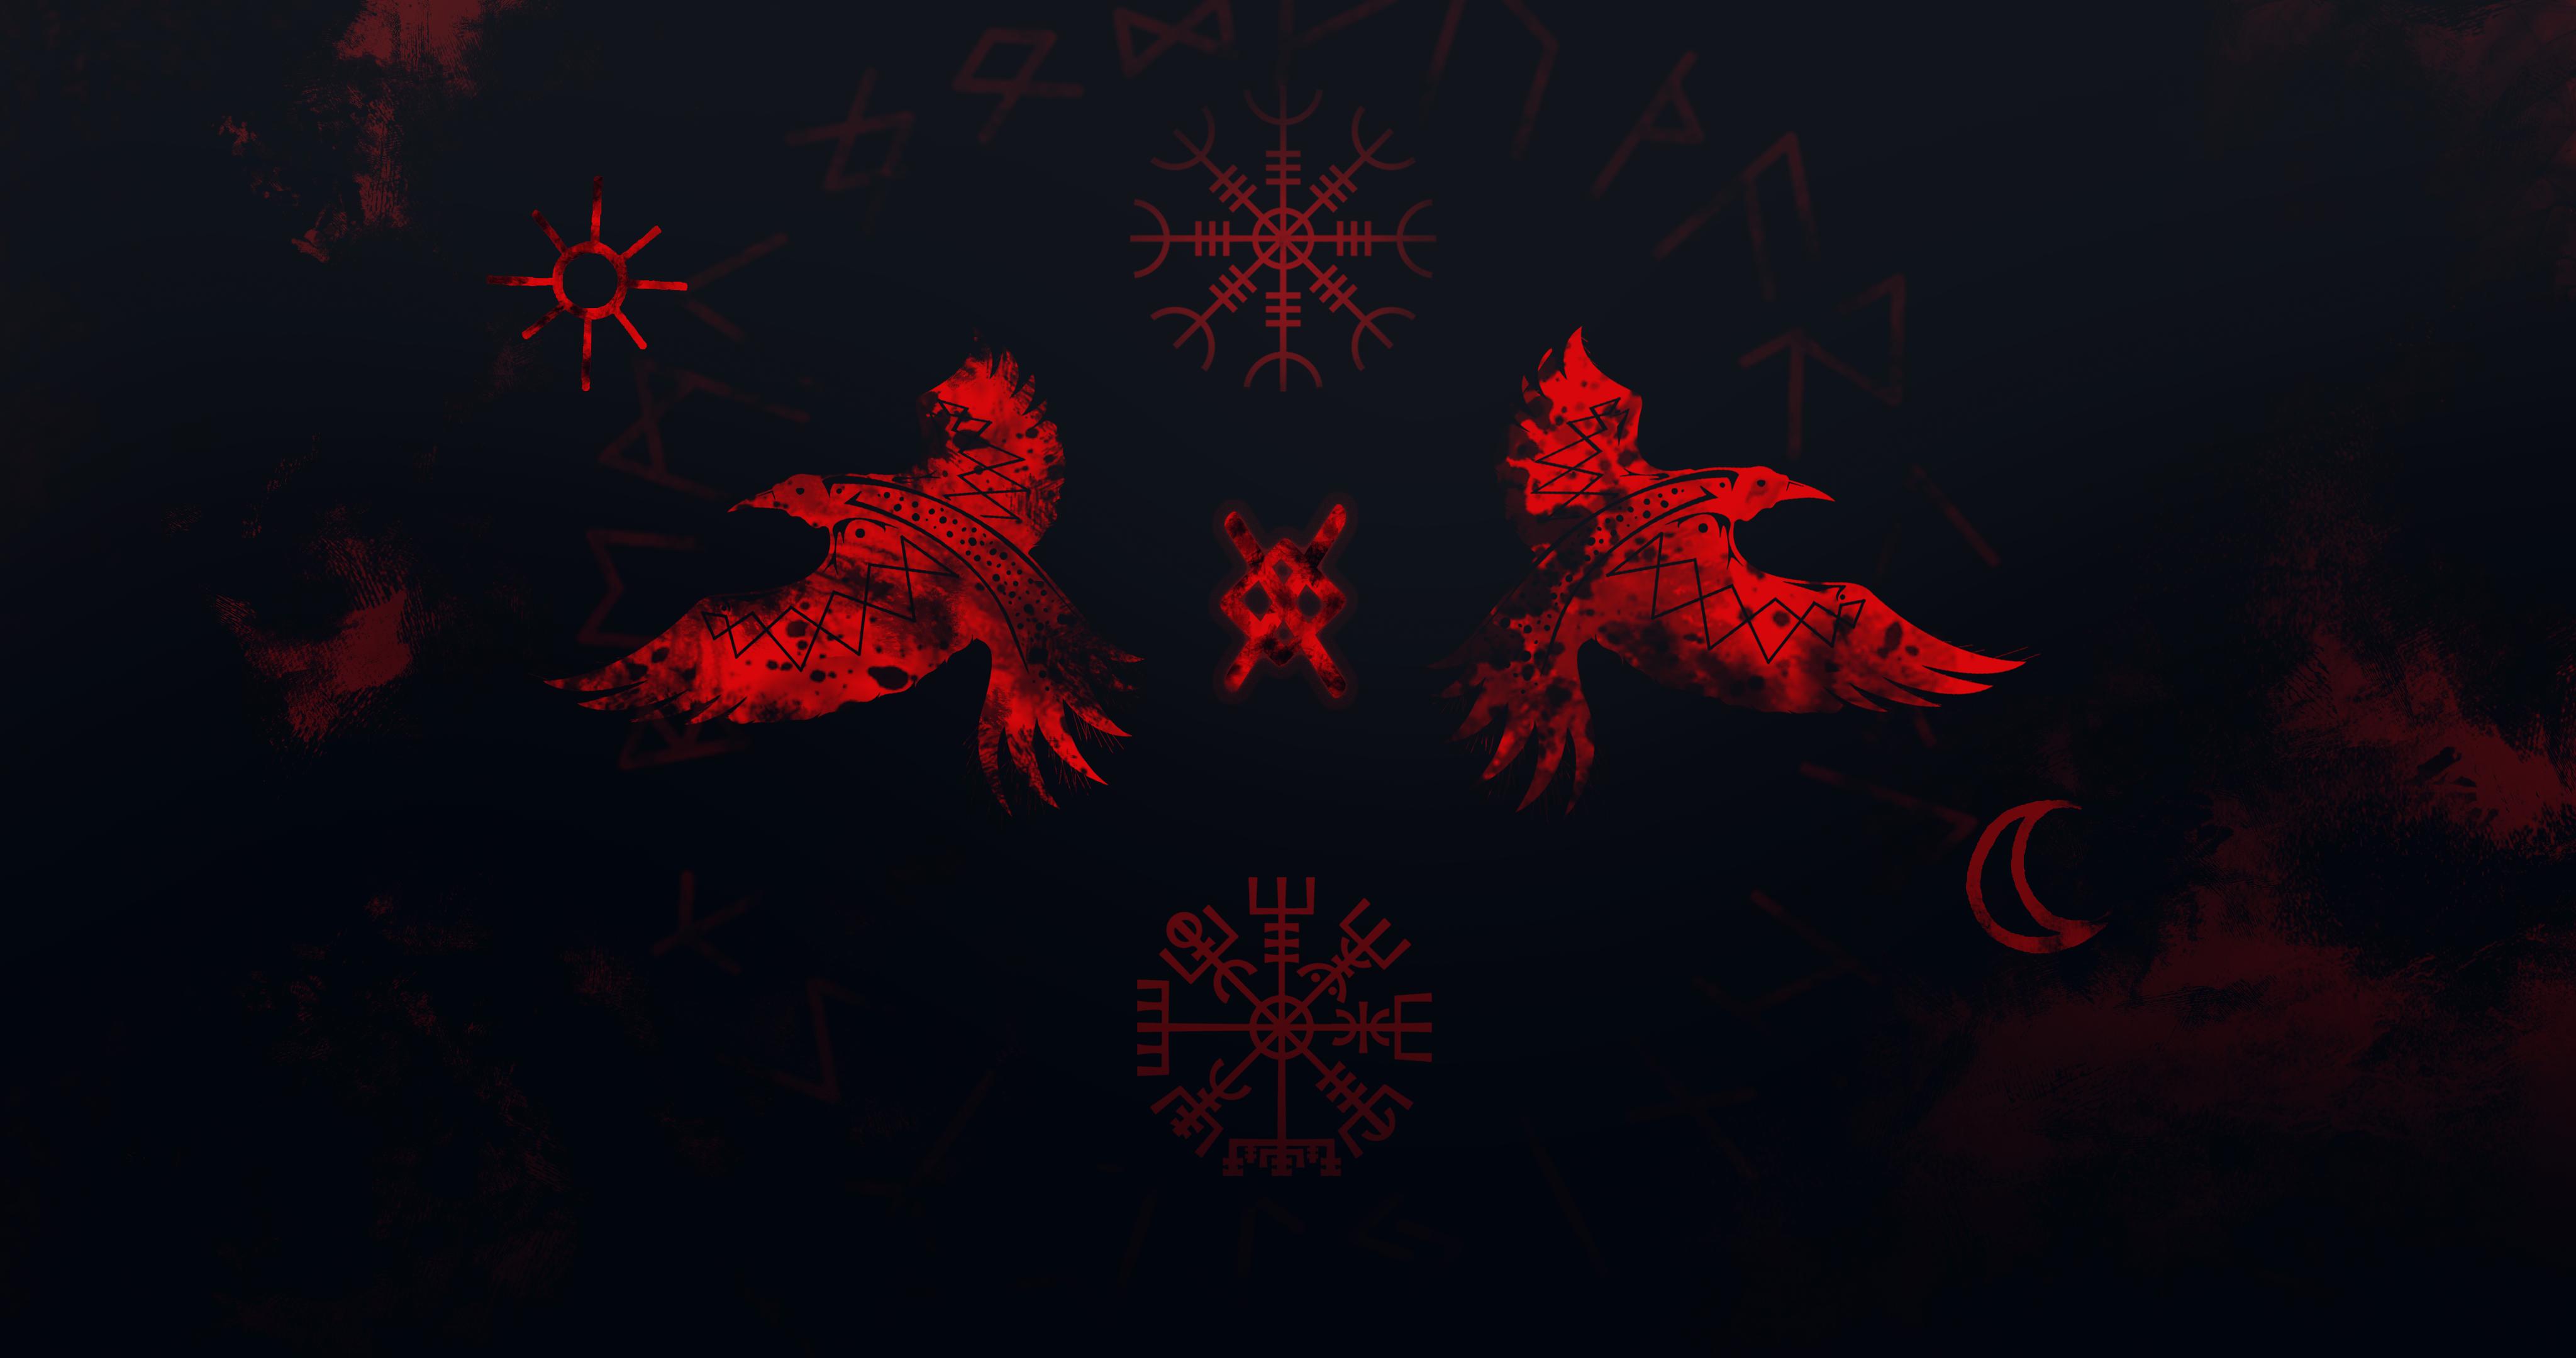 General 4096x2160 Huginn Muninn Vikings runes raven red Odin